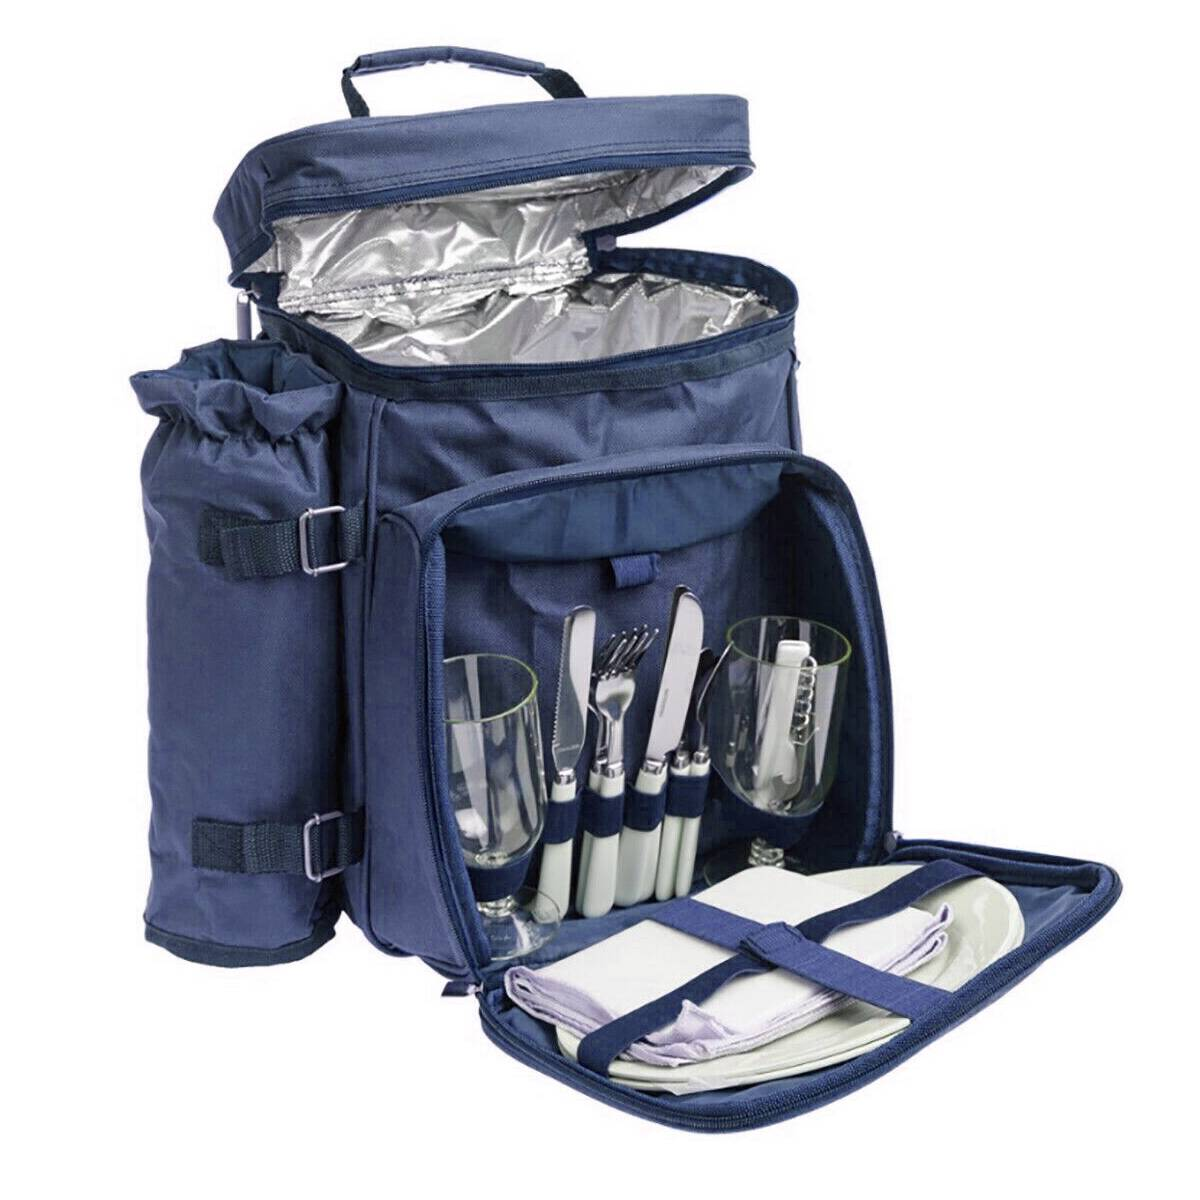 Gardman Picnic Bag 2 Person - Navy Blue